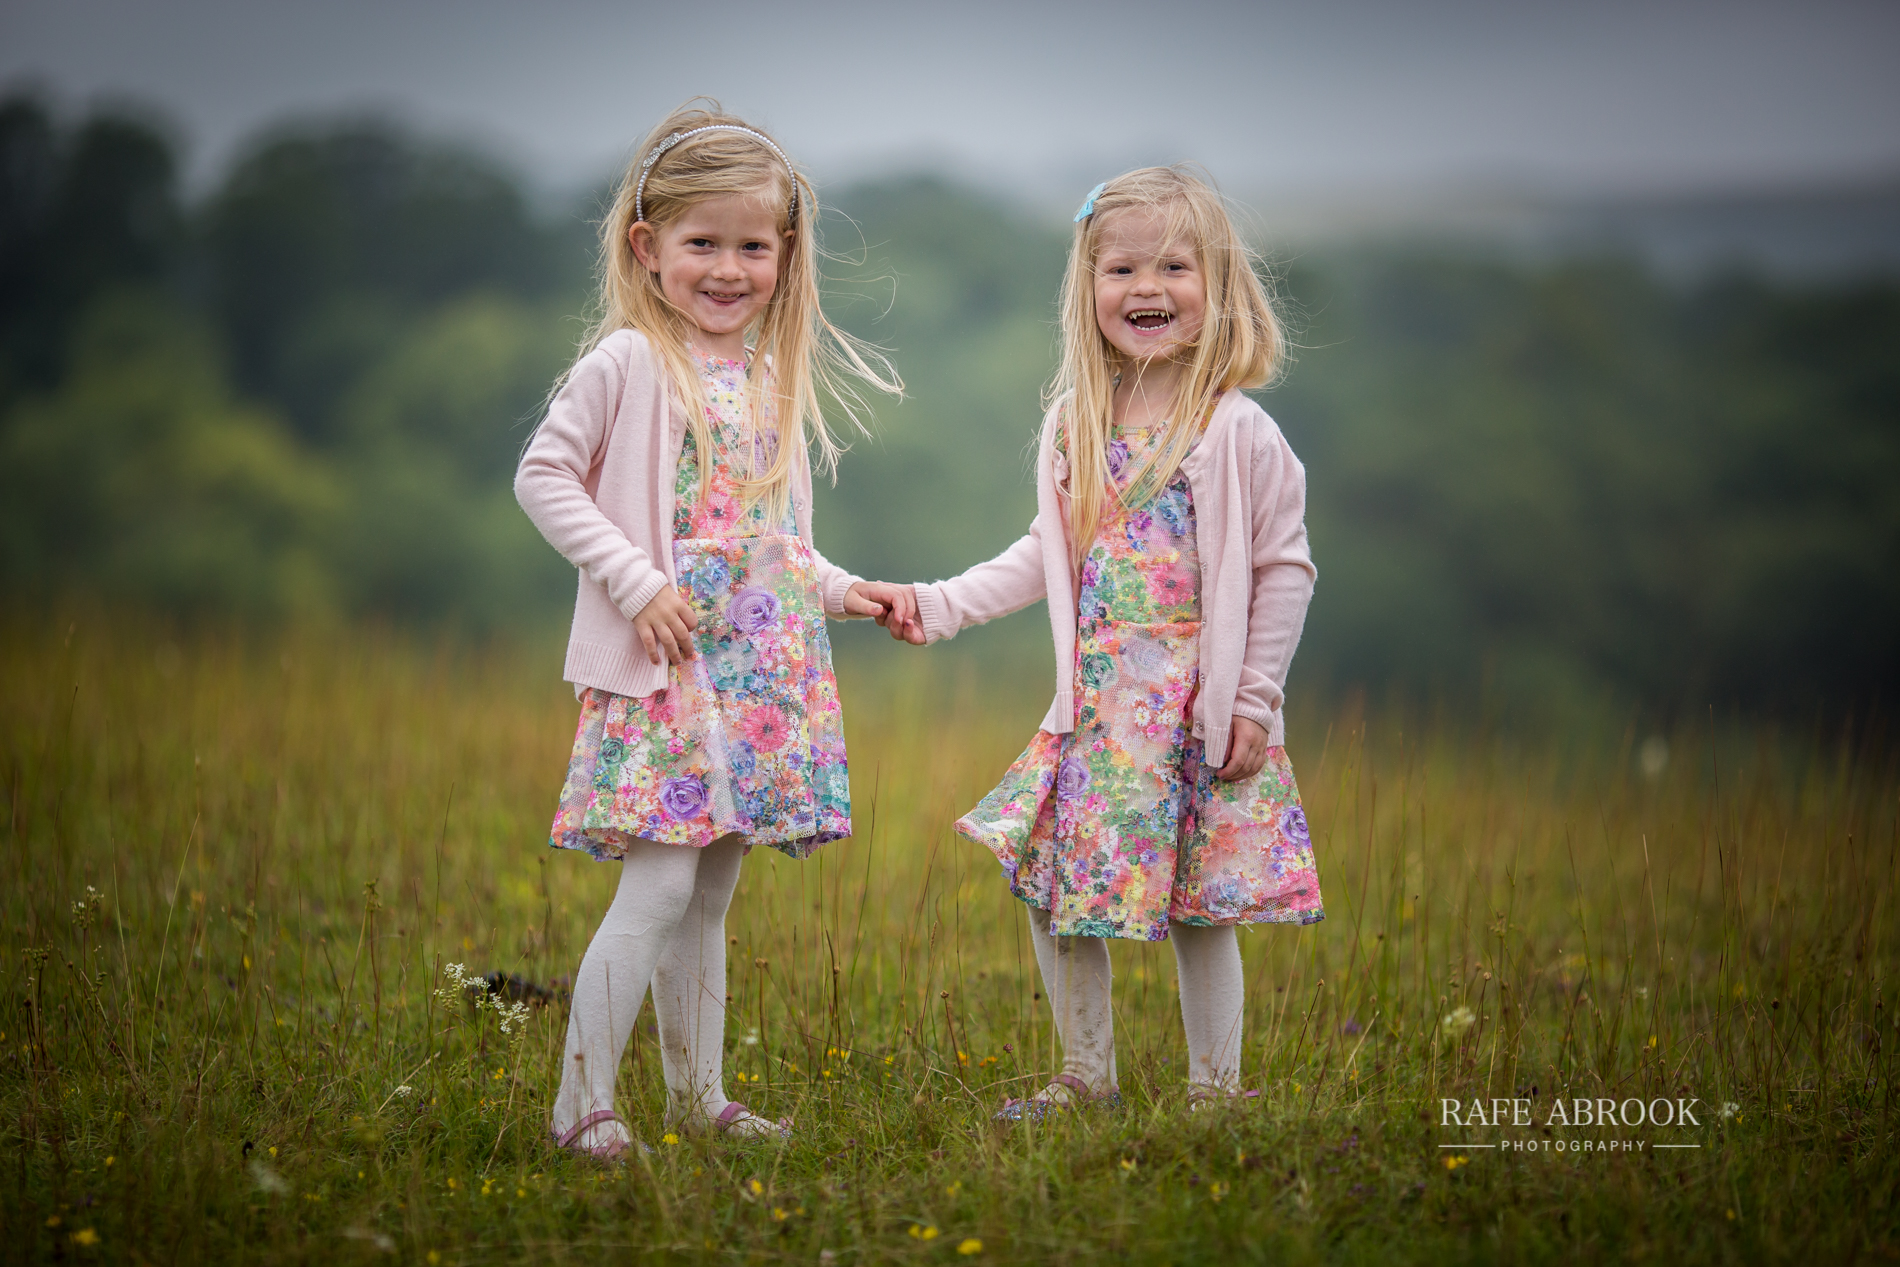 lisa & danny engagement shoot barton hills barton-le-clay bedfordshire-1027.jpg